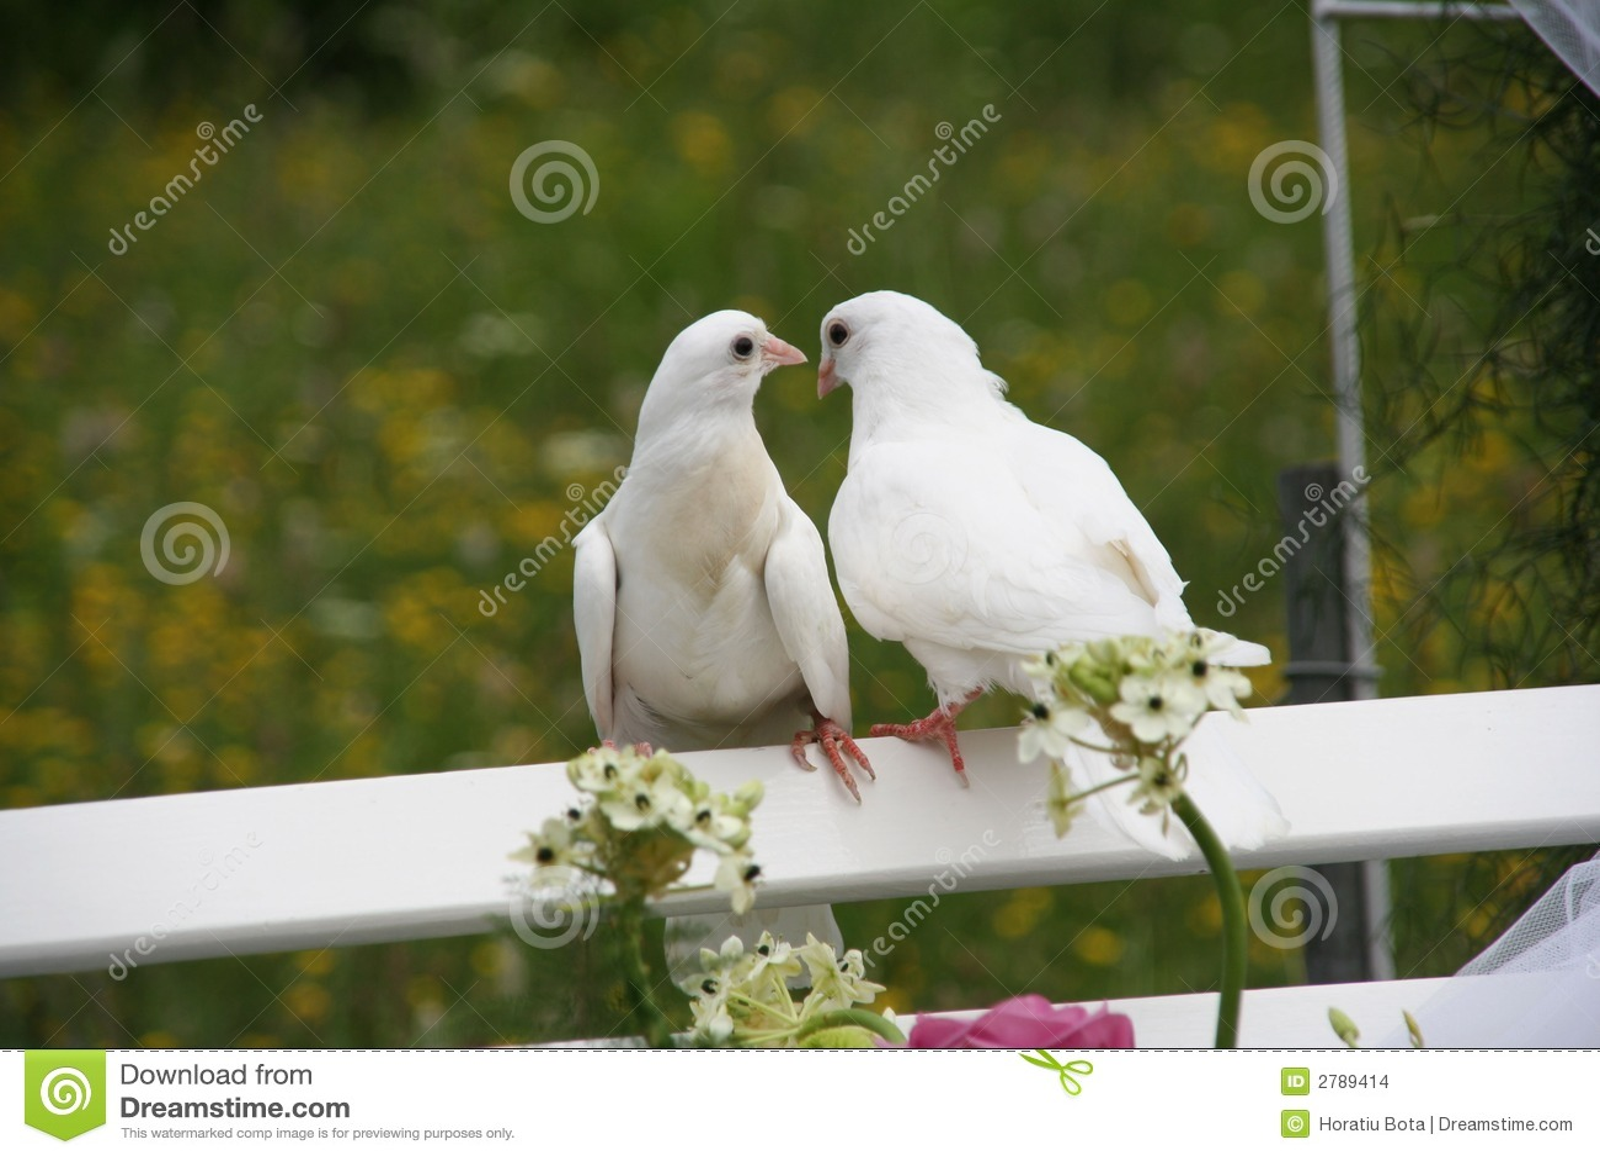 Wedding doves stock photo Image of decision marriage